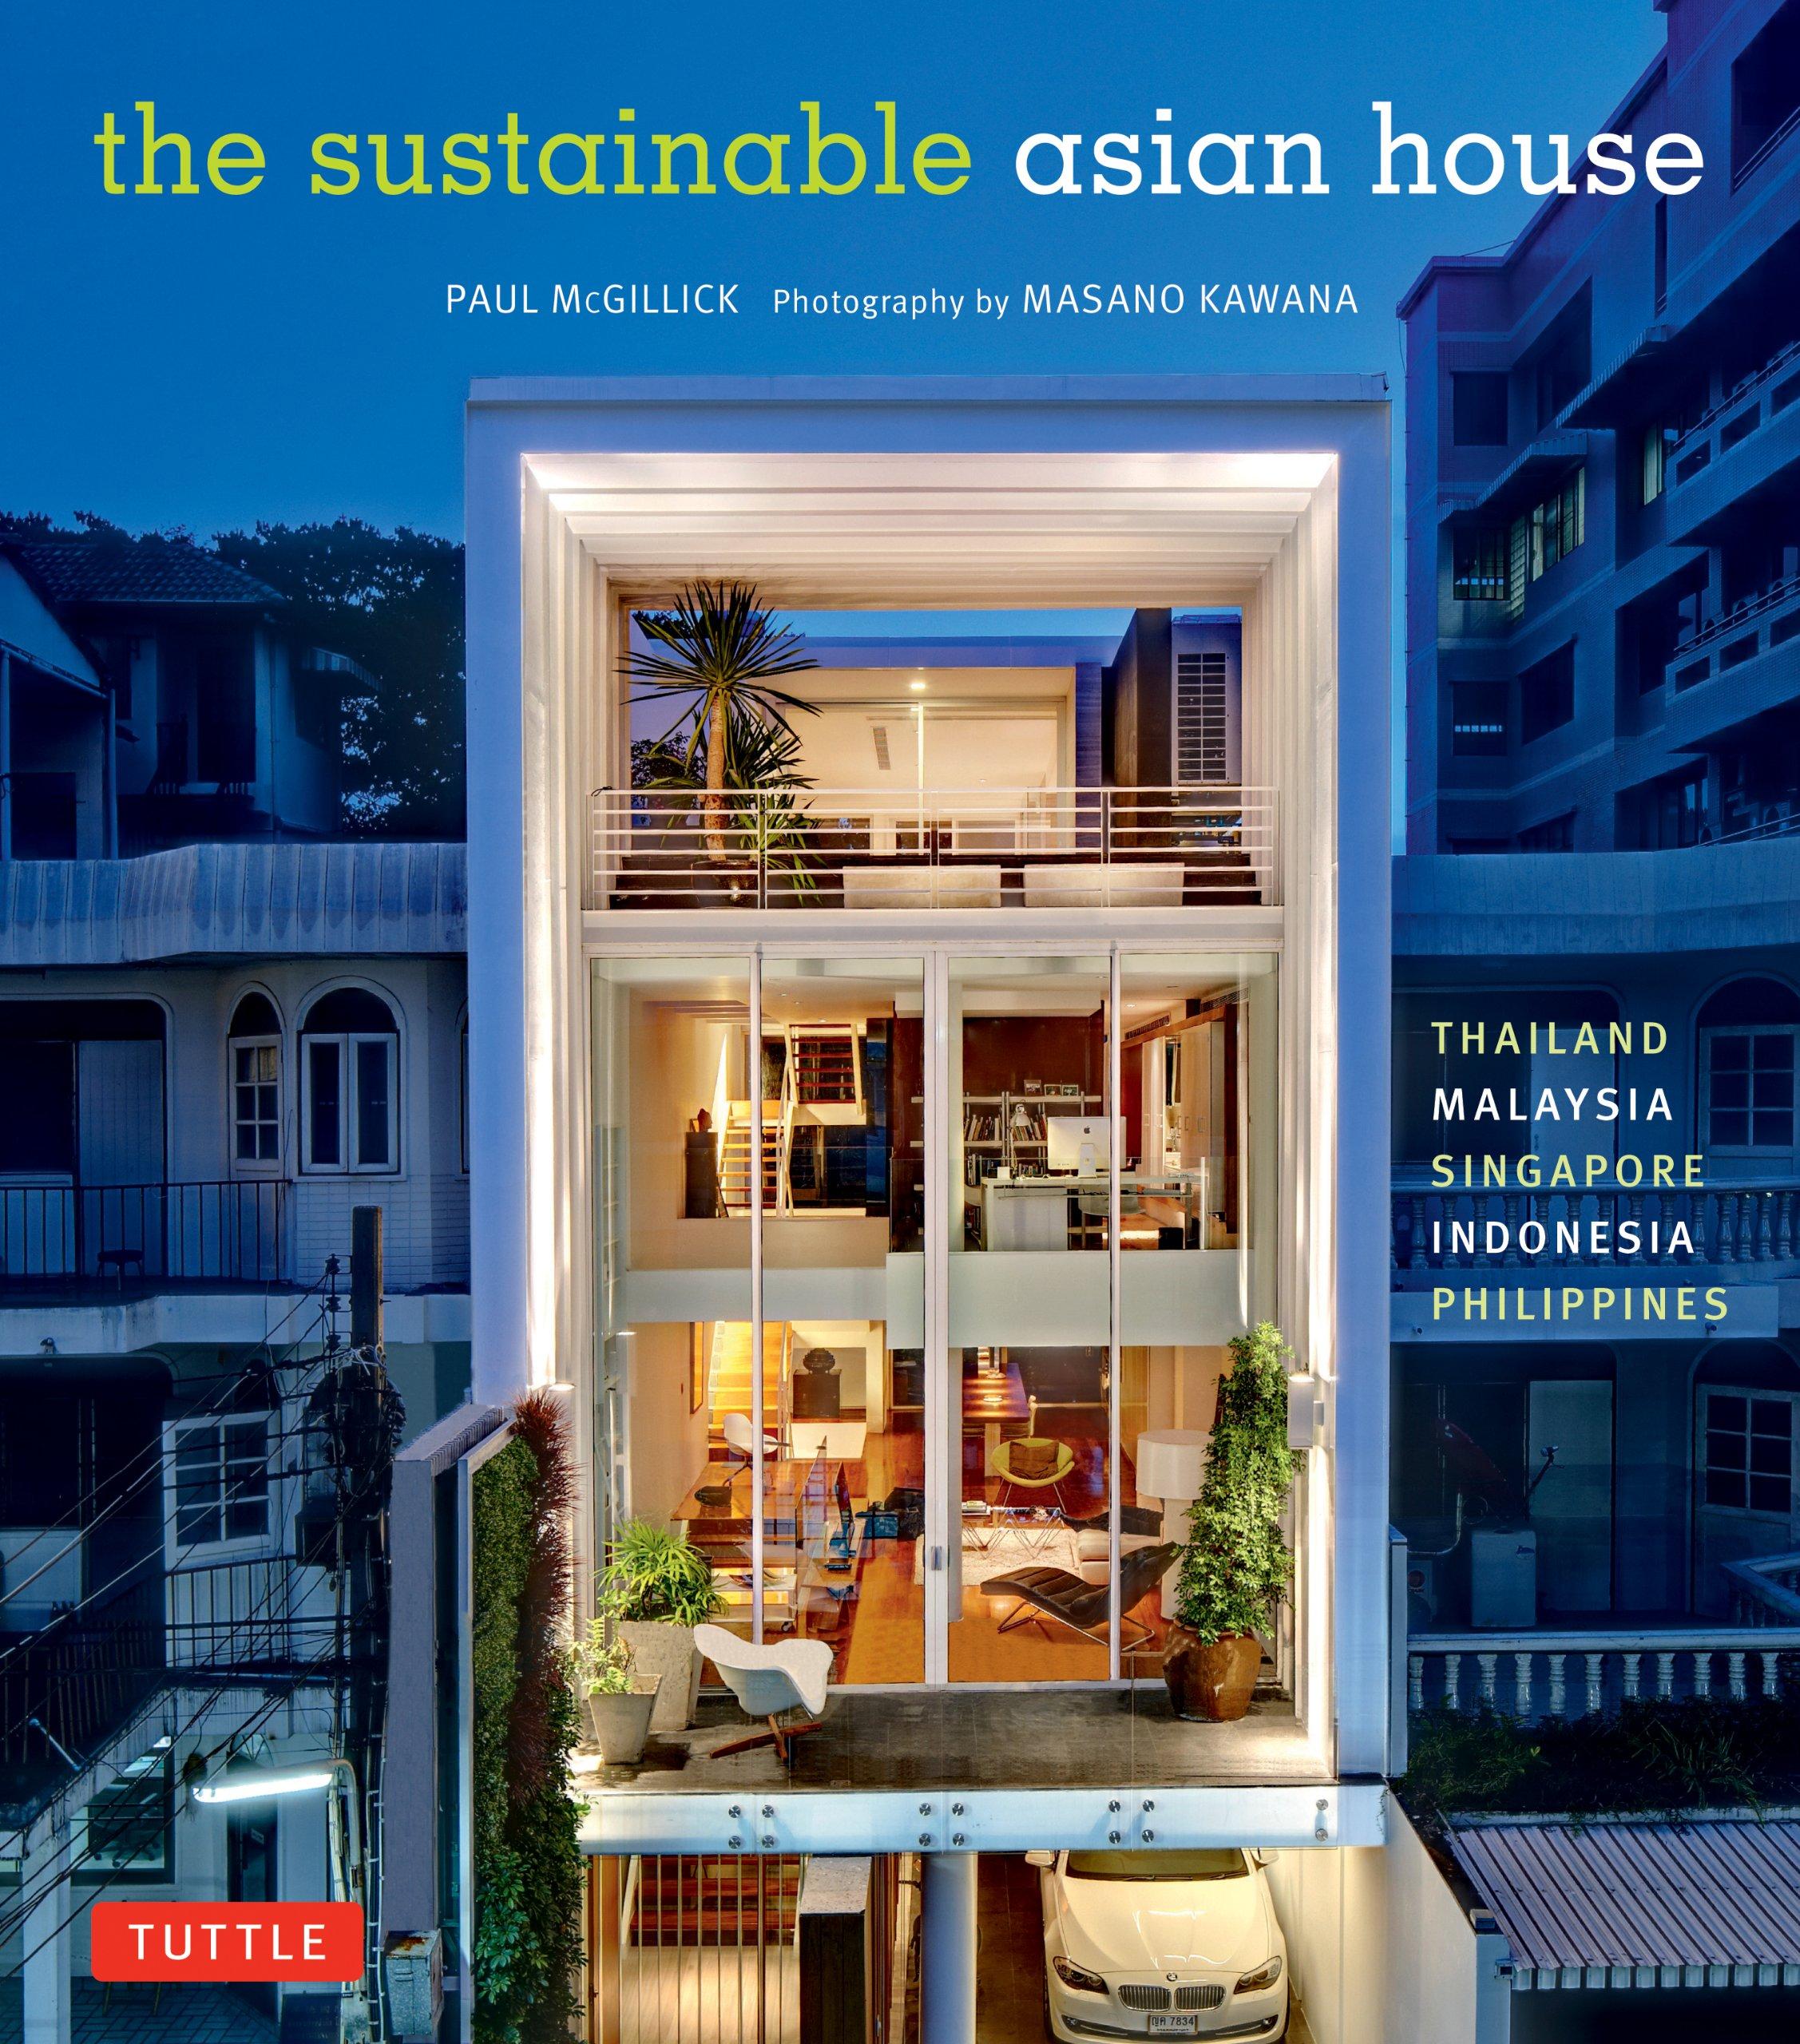 Sustainable Asian House: Thailand, Malaysia, Singapore, Indonesia, Philippines